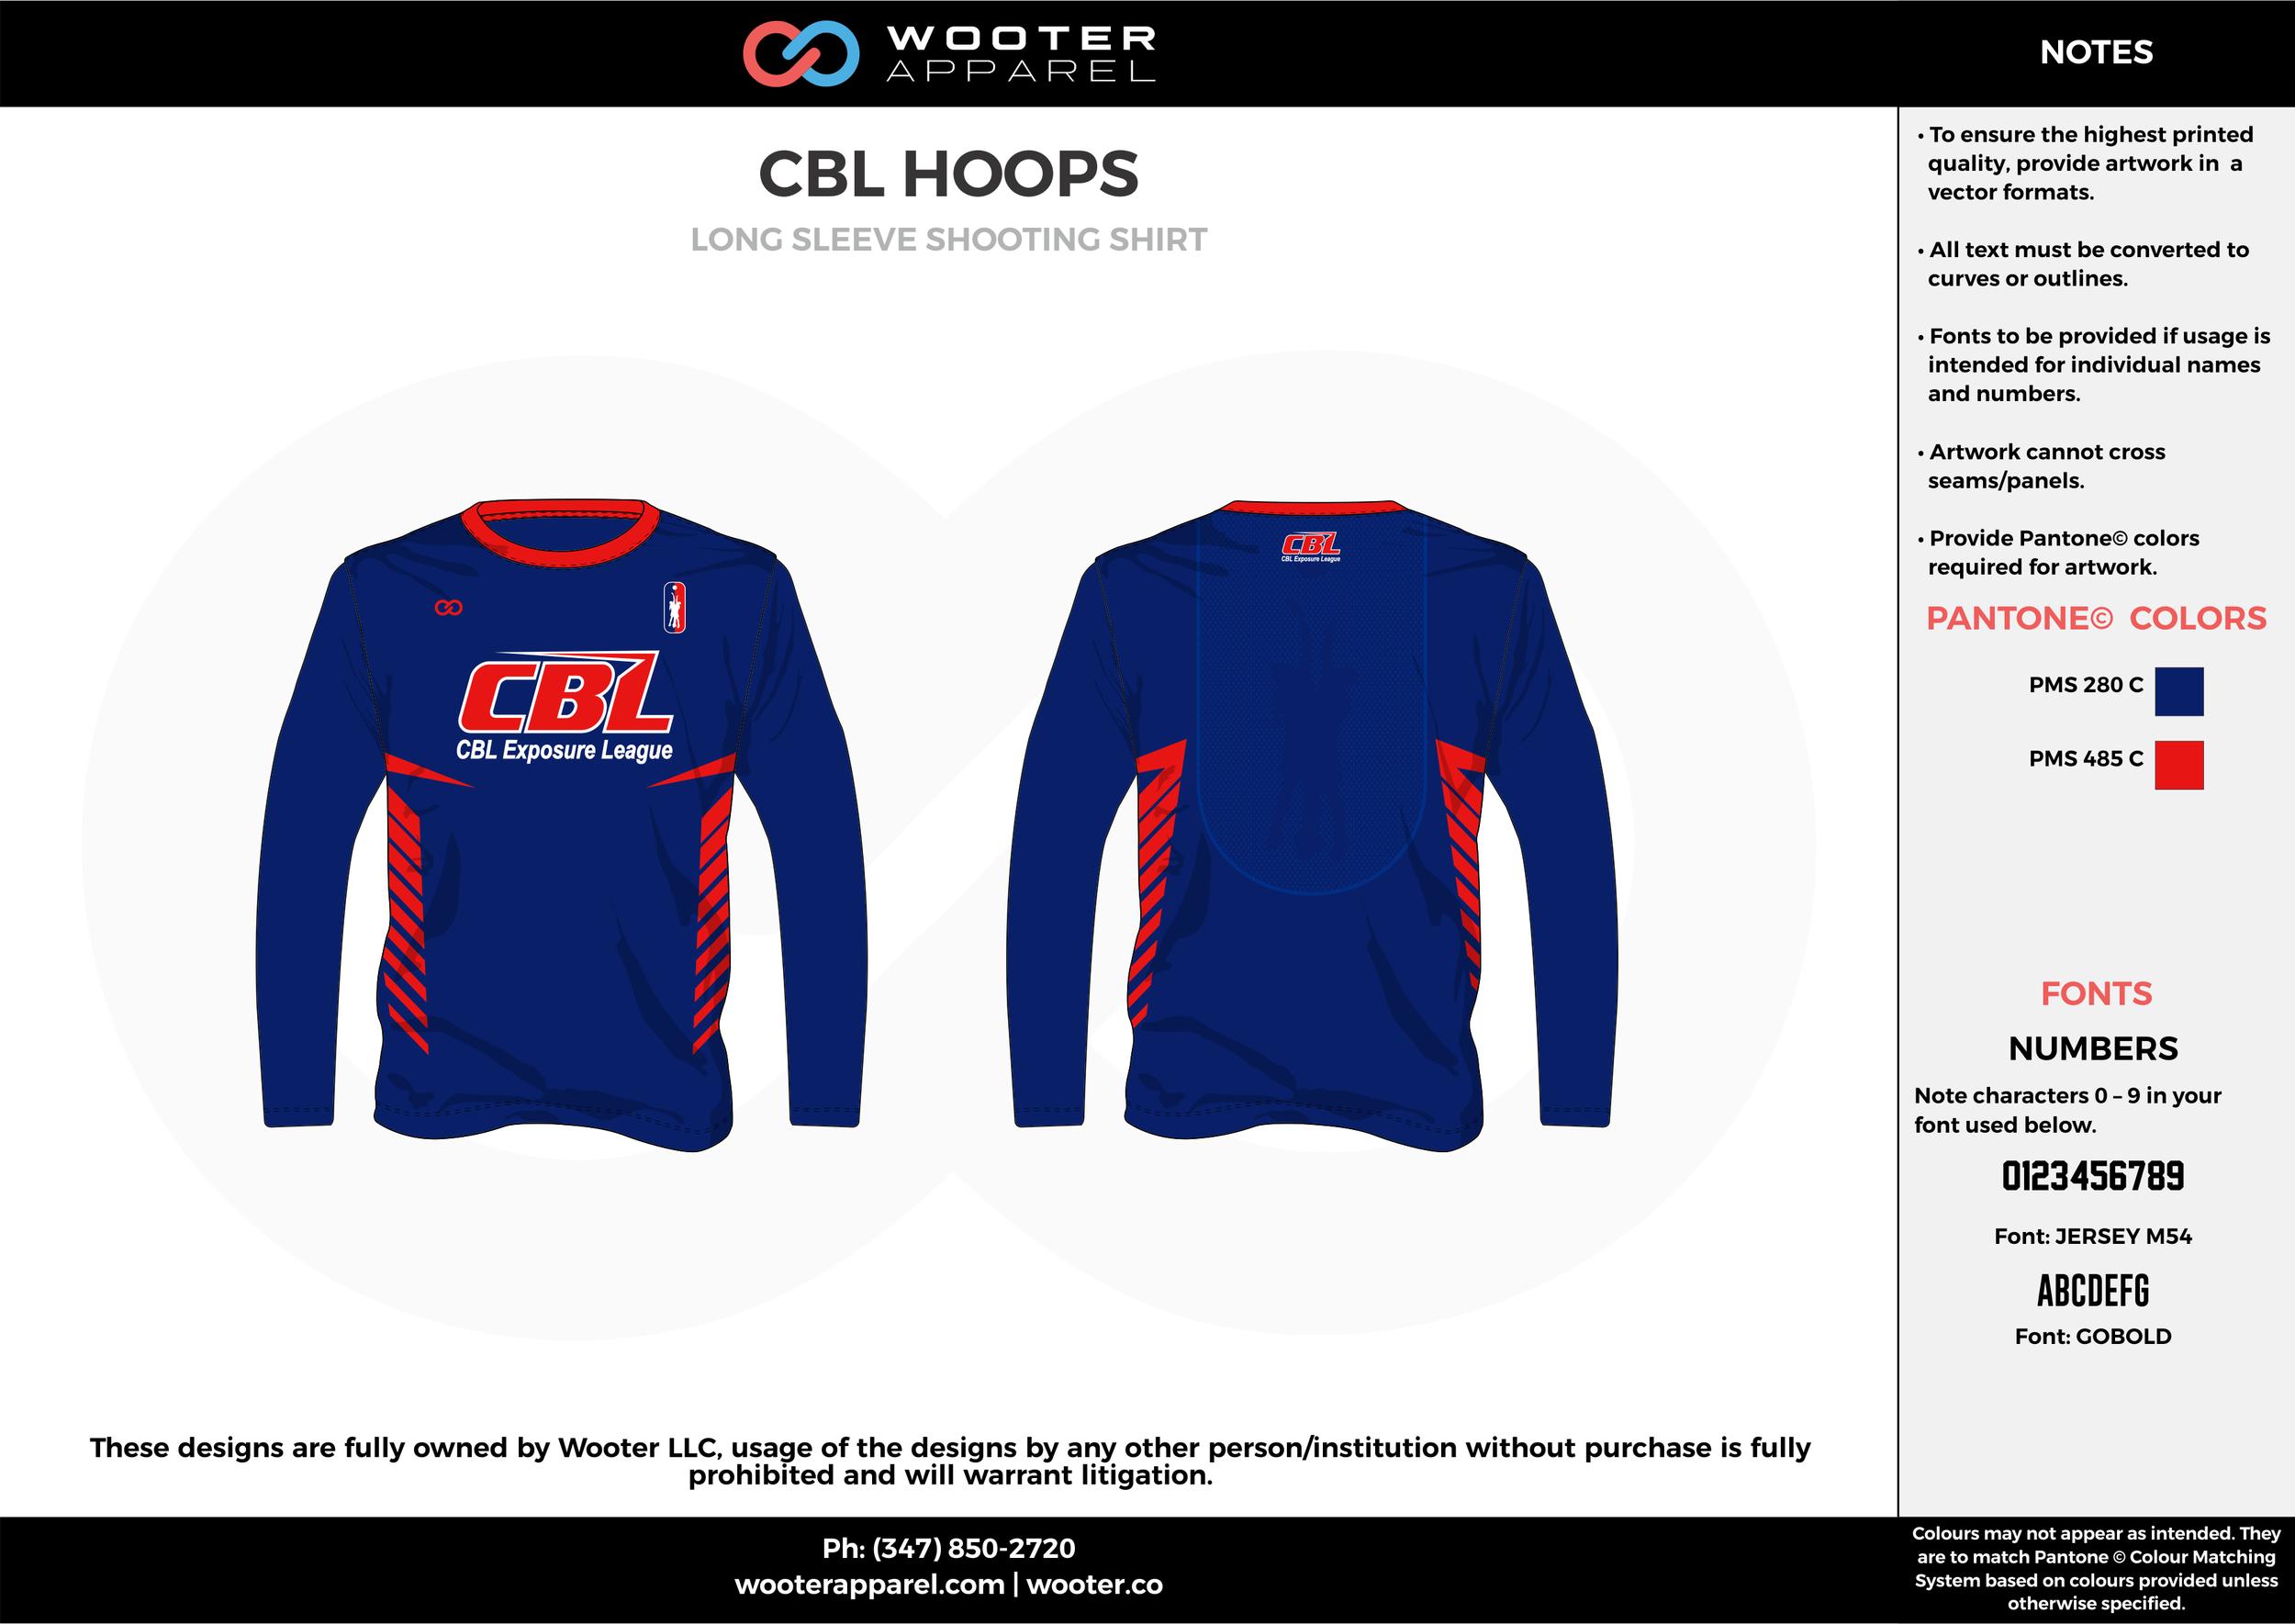 CBL HOOPS blue red Basketball Long Sleeve Shooting Shirt